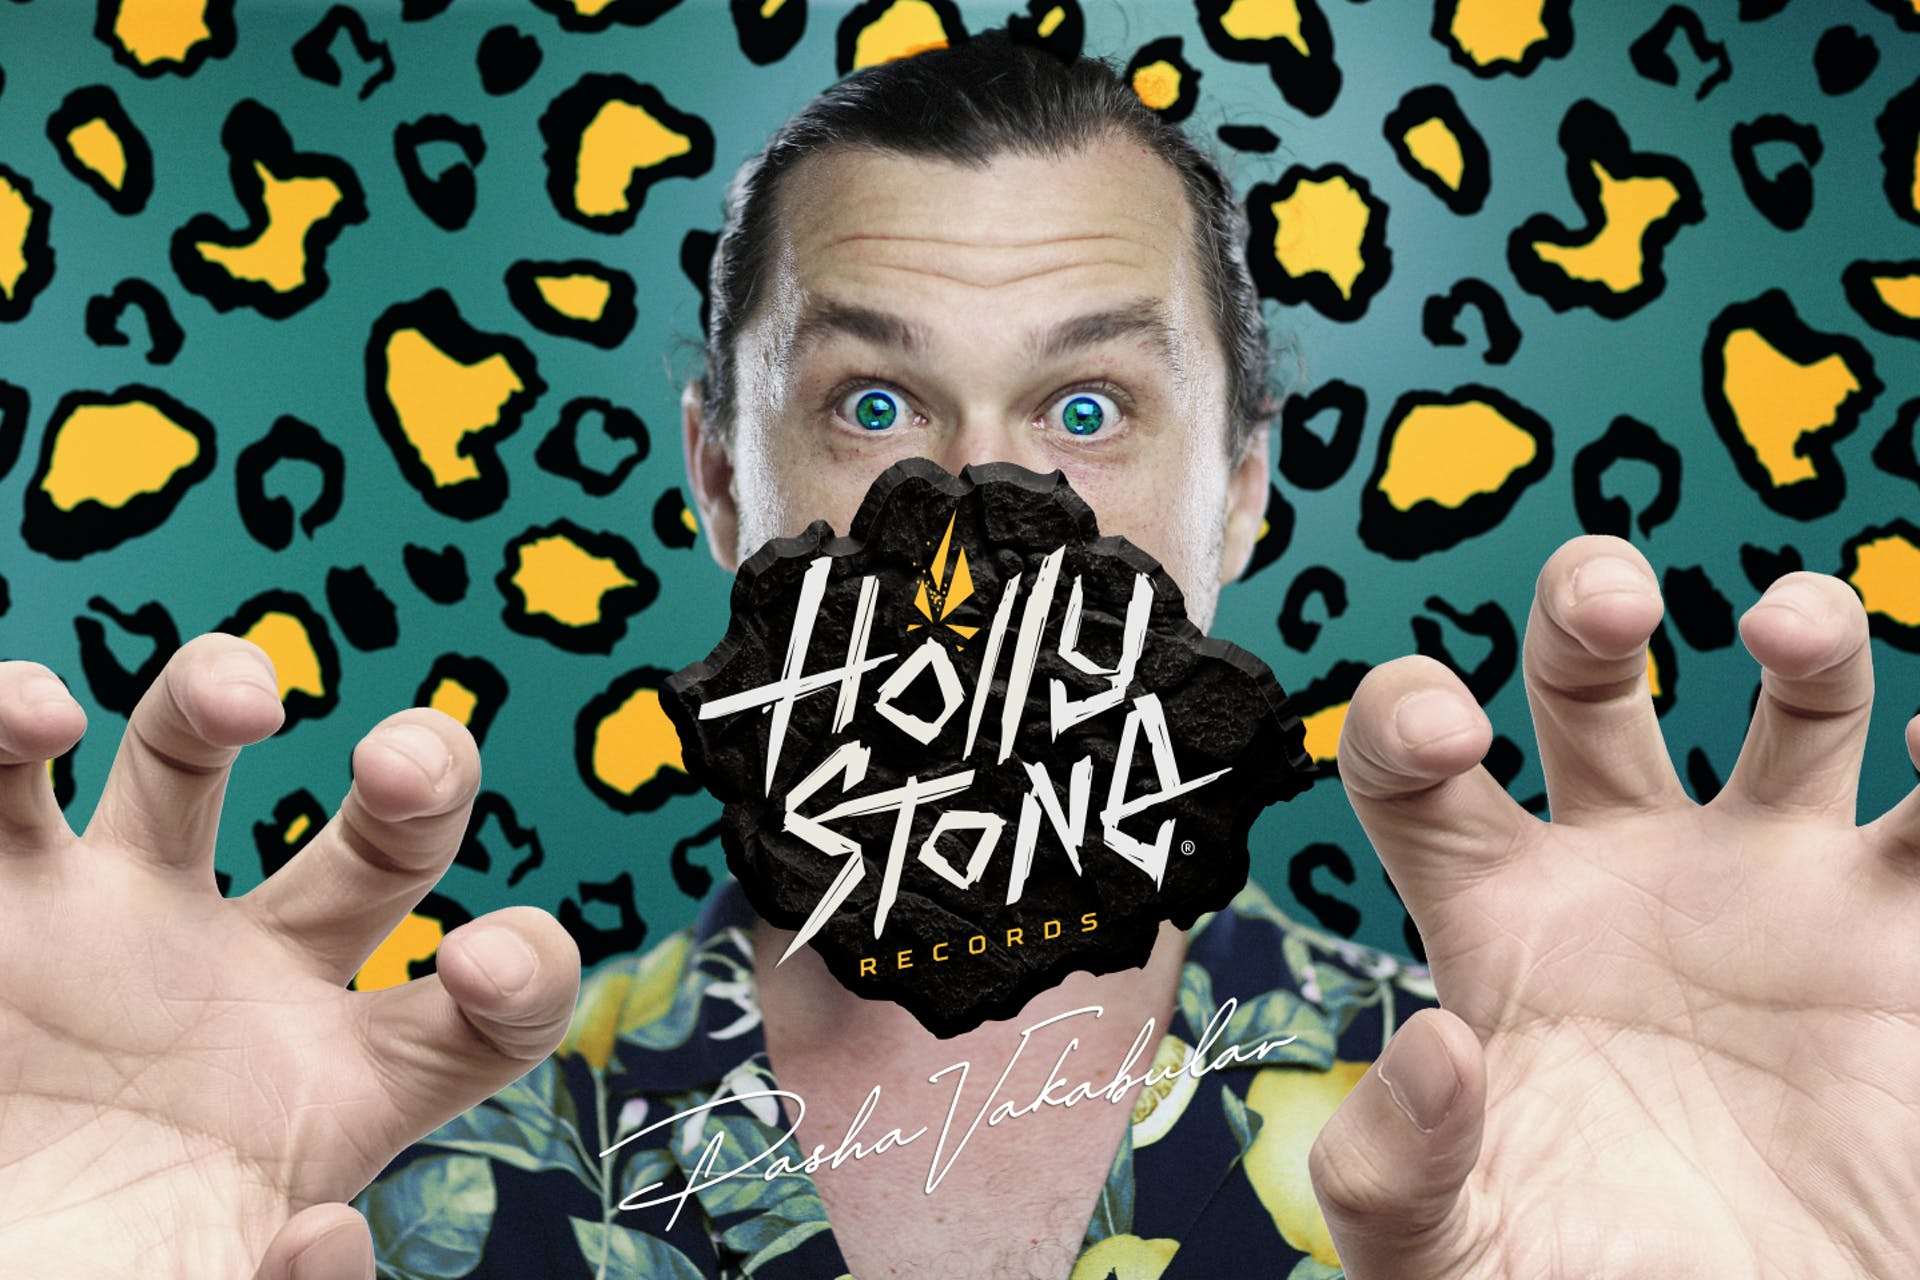 Identity HollyStone records